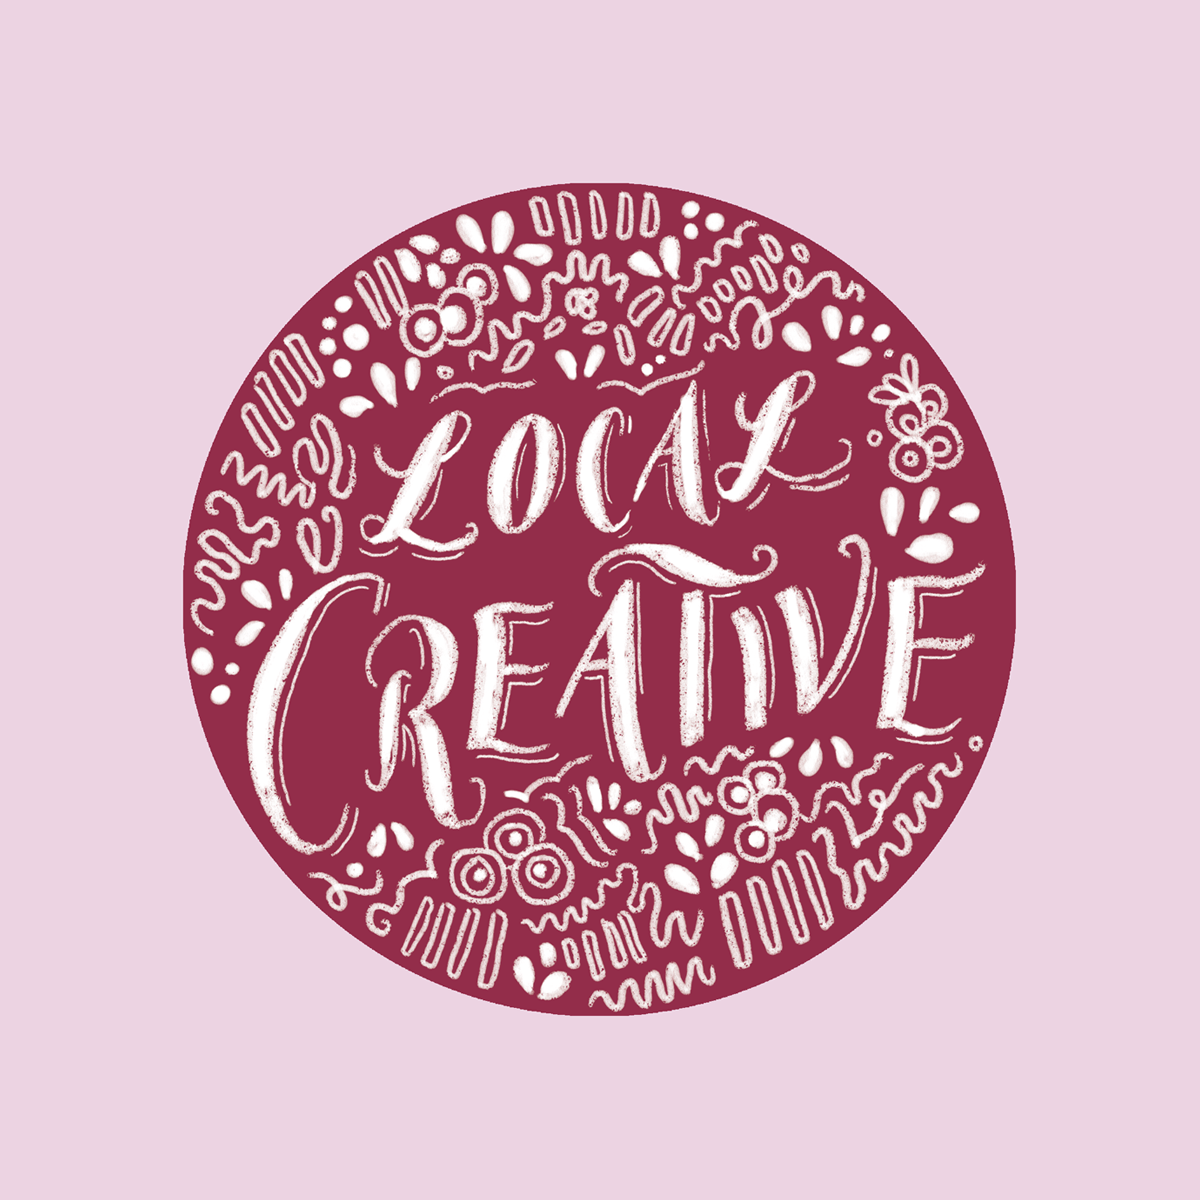 local-creative